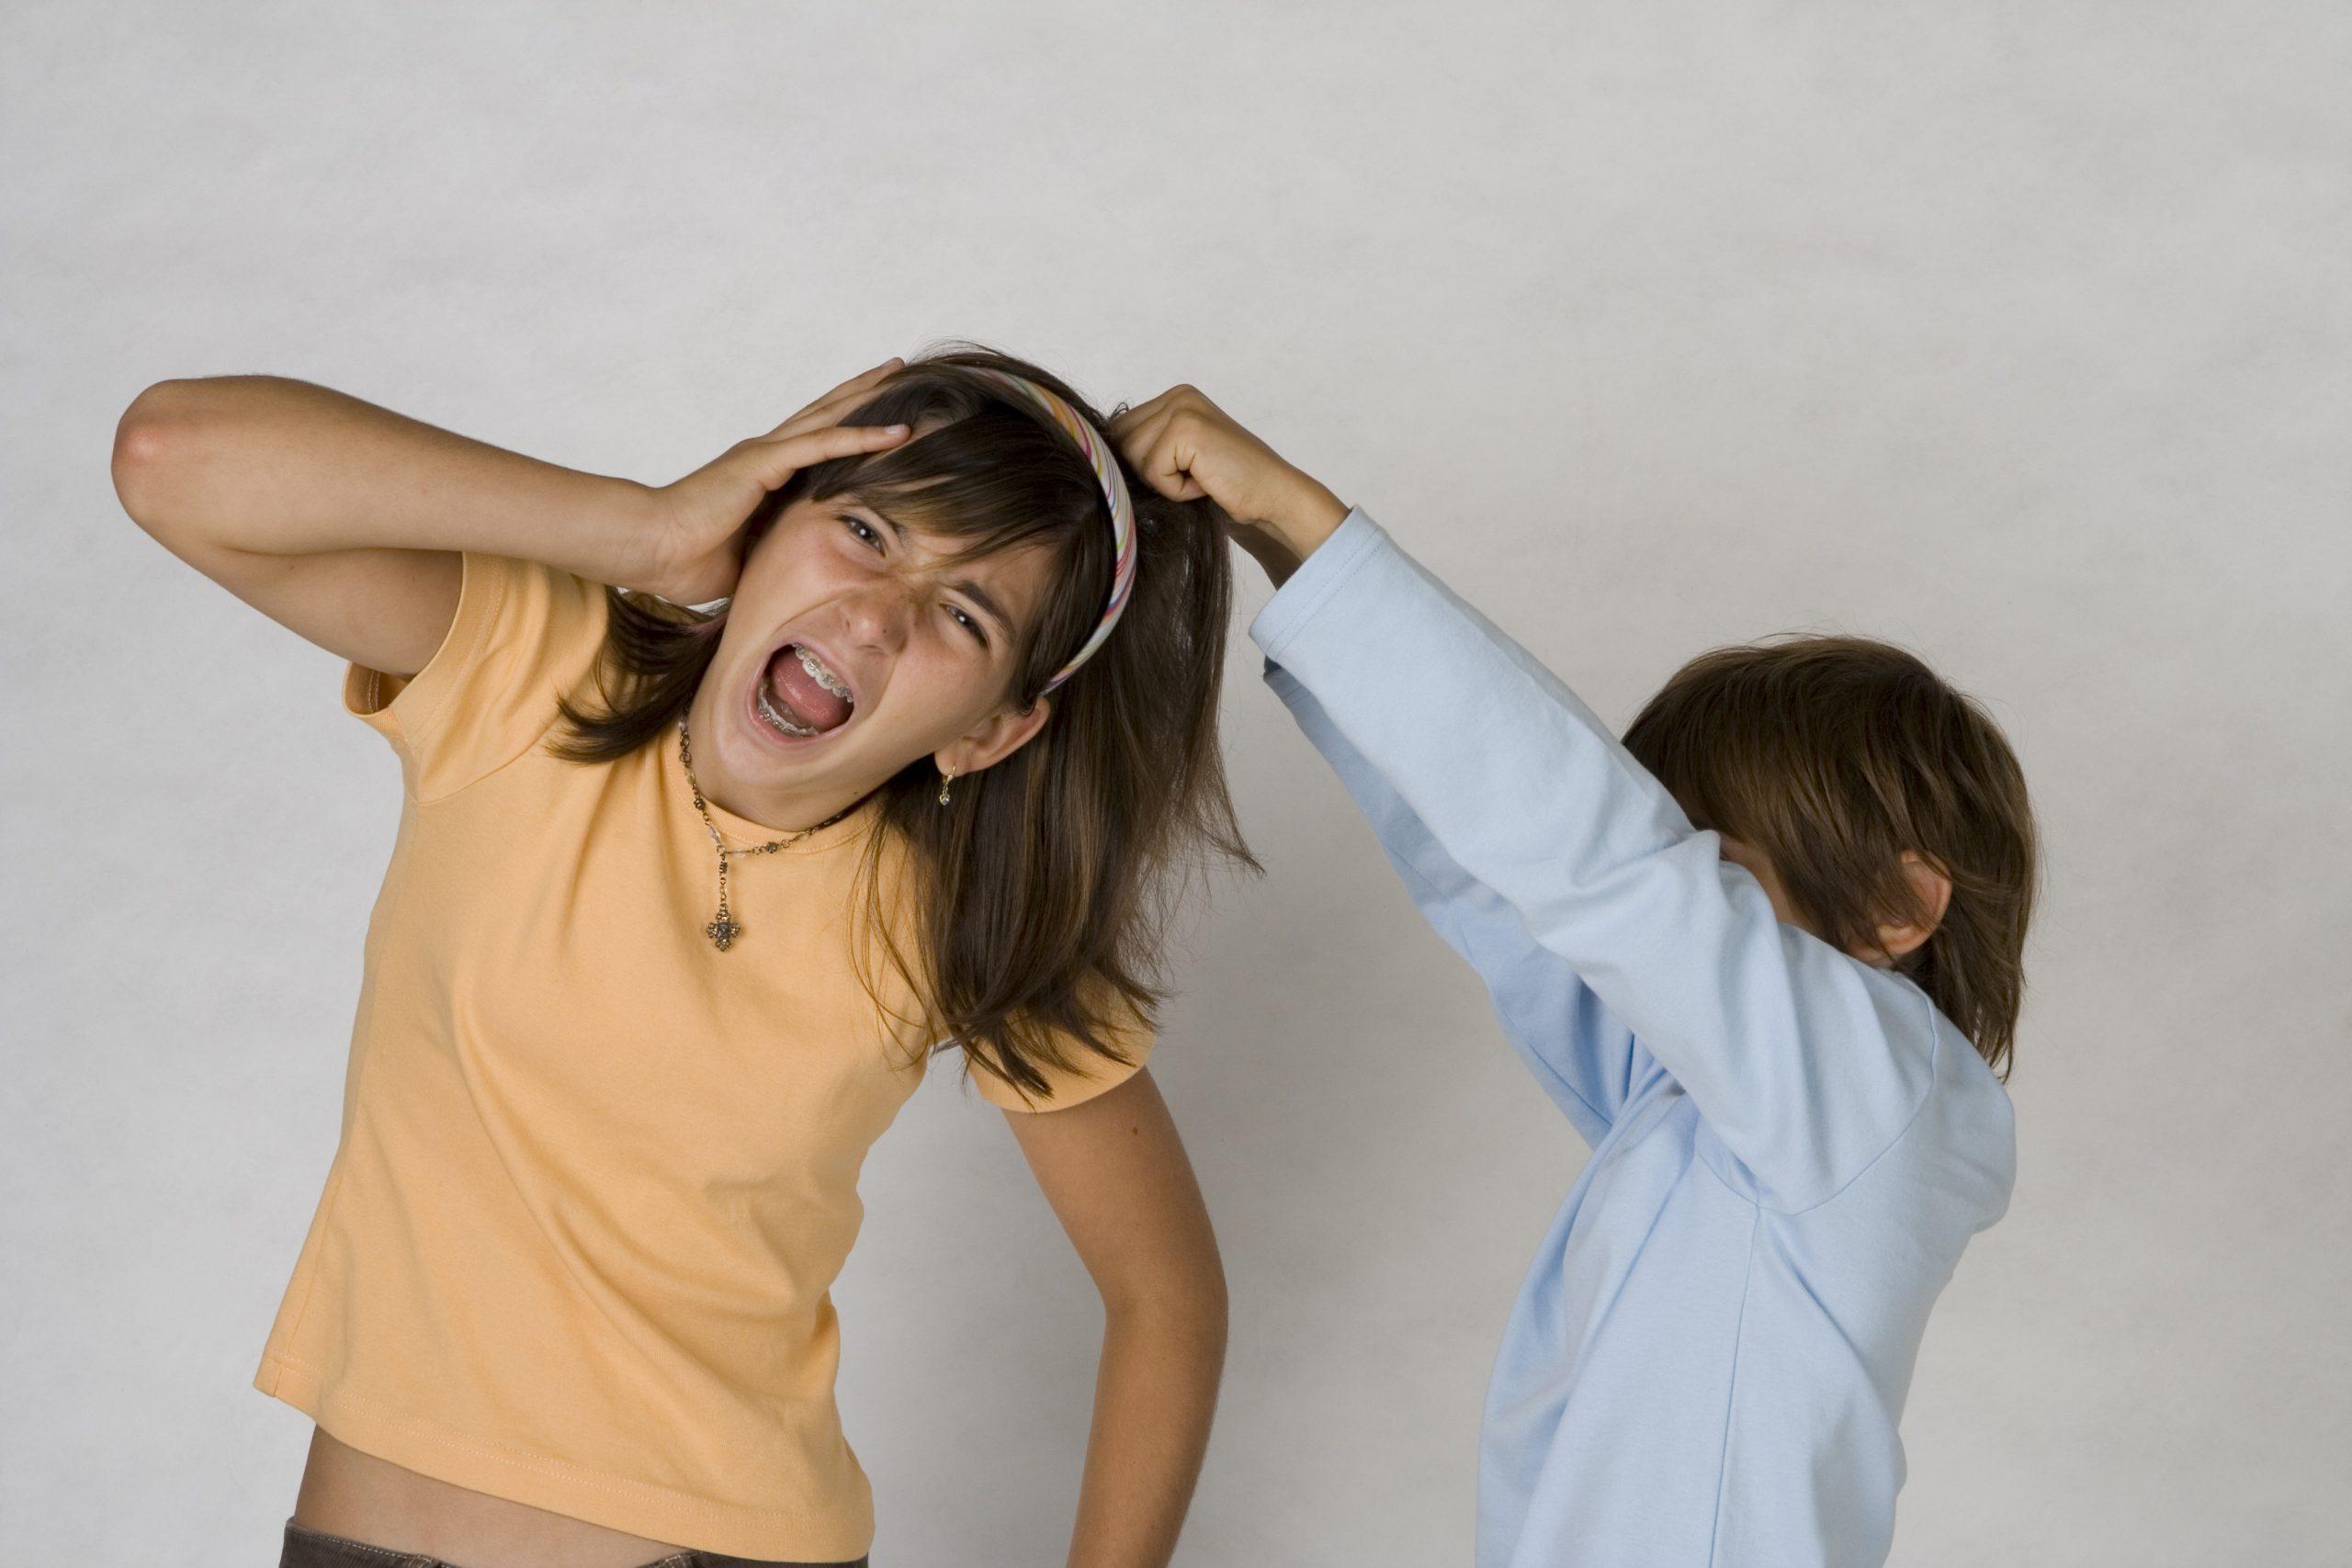 Stir-Crazy Kids: How to Referee Fighting